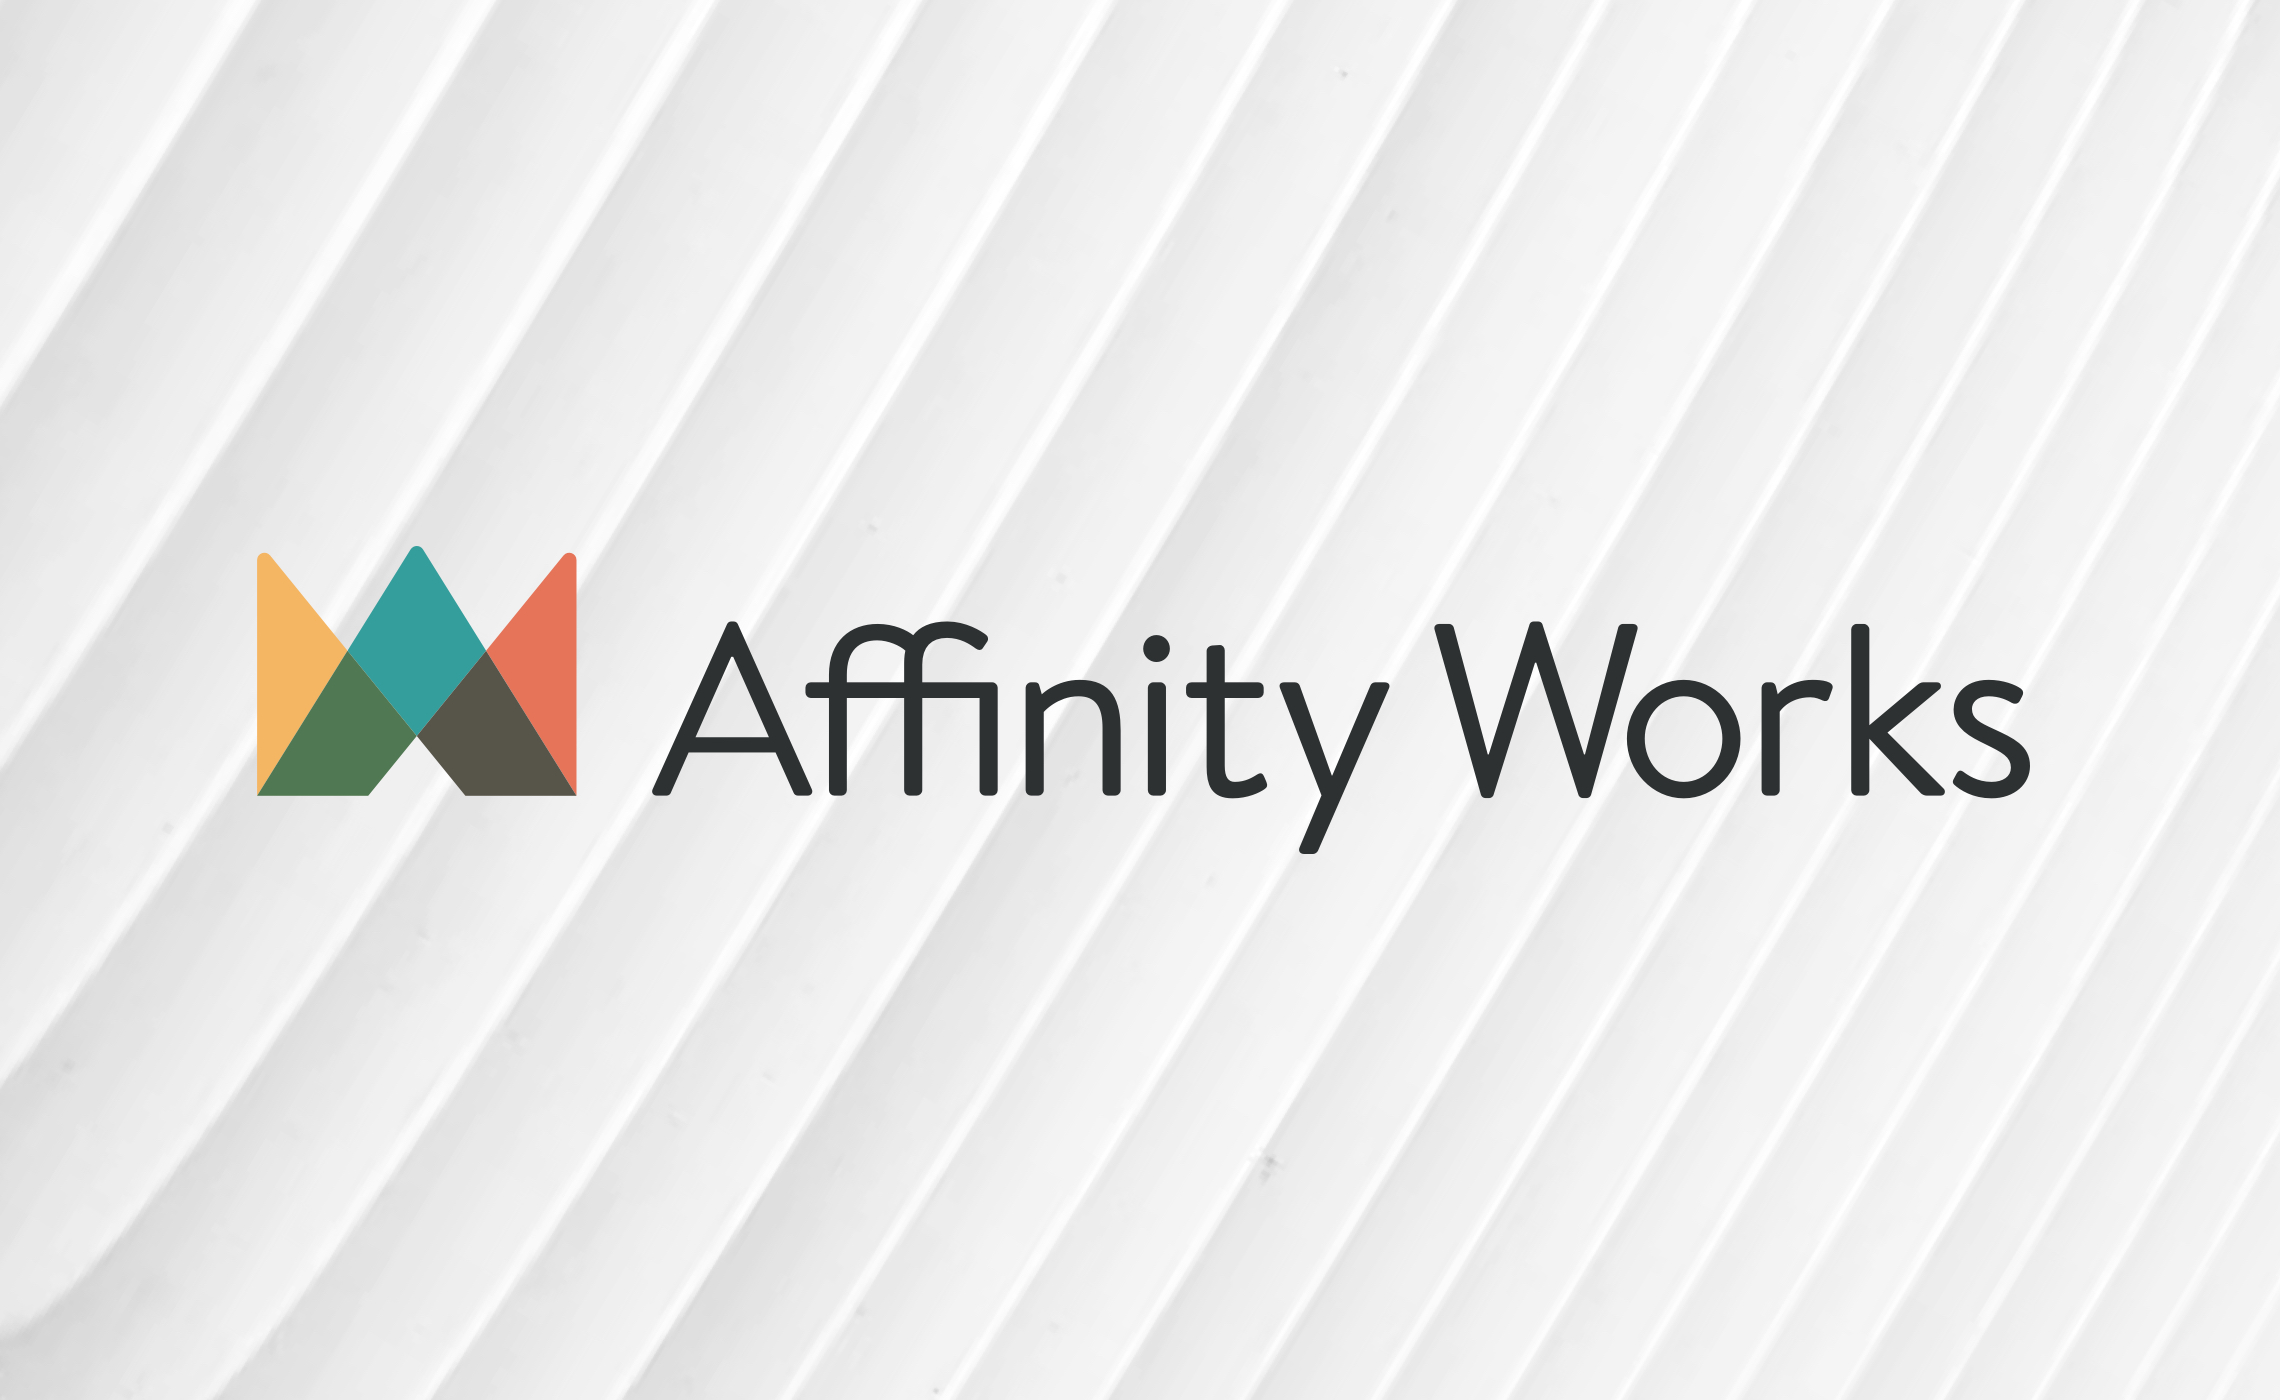 Affinity Works – brand identity